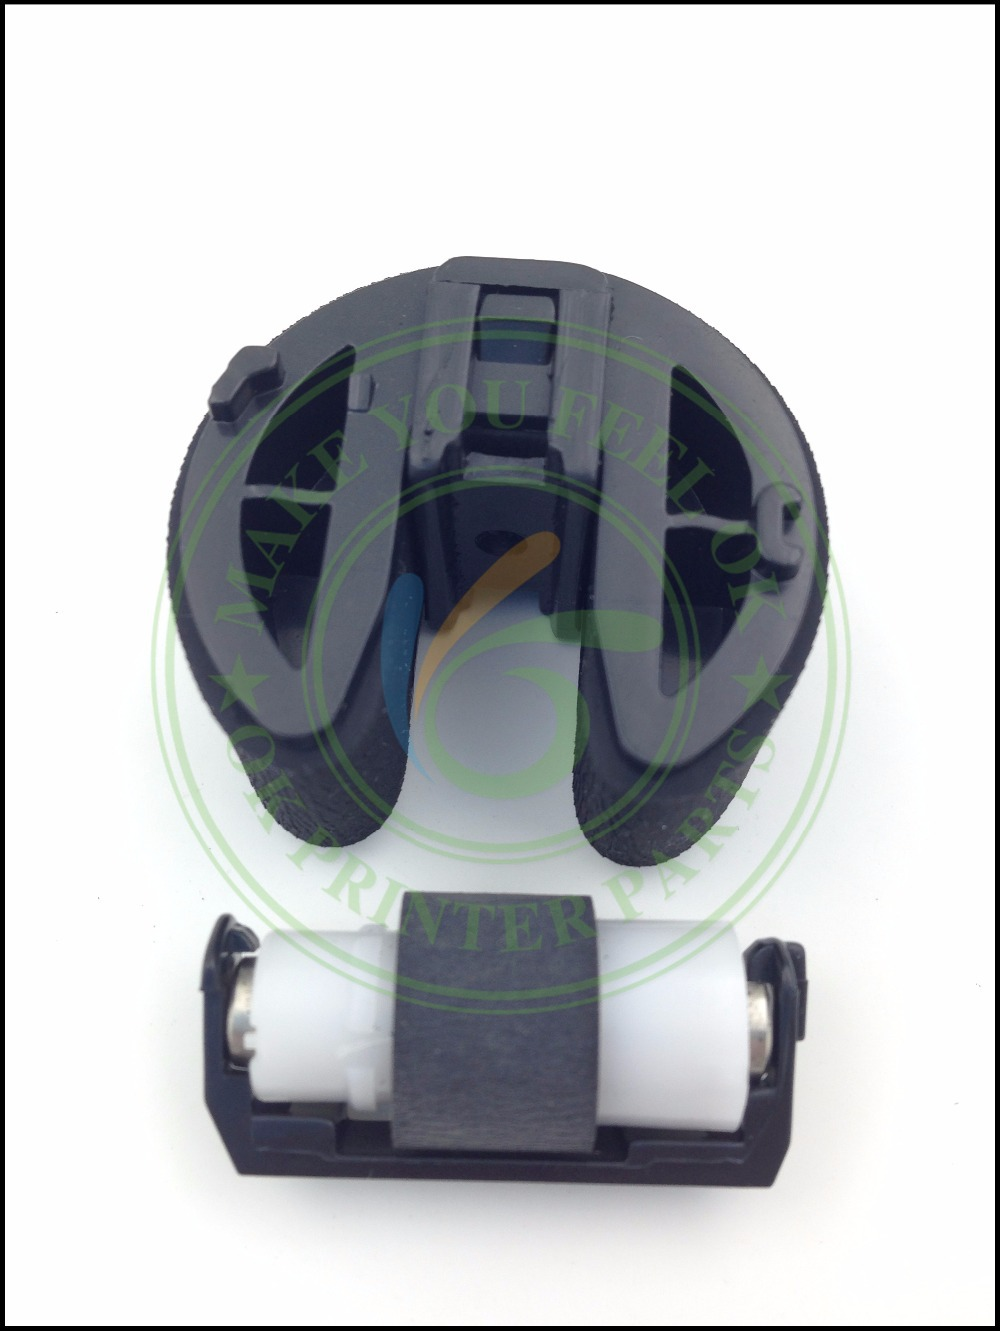 5X CC430 67901 RM1 4425 RM1 8765 RM1 4426 Pickup Roller for HP CM1312 CP1215 CP1515 CP1518 CM1415 CP1525 CP2025 CM2320 M251 M351pickup roller assemblyroller assemblypickup roller -